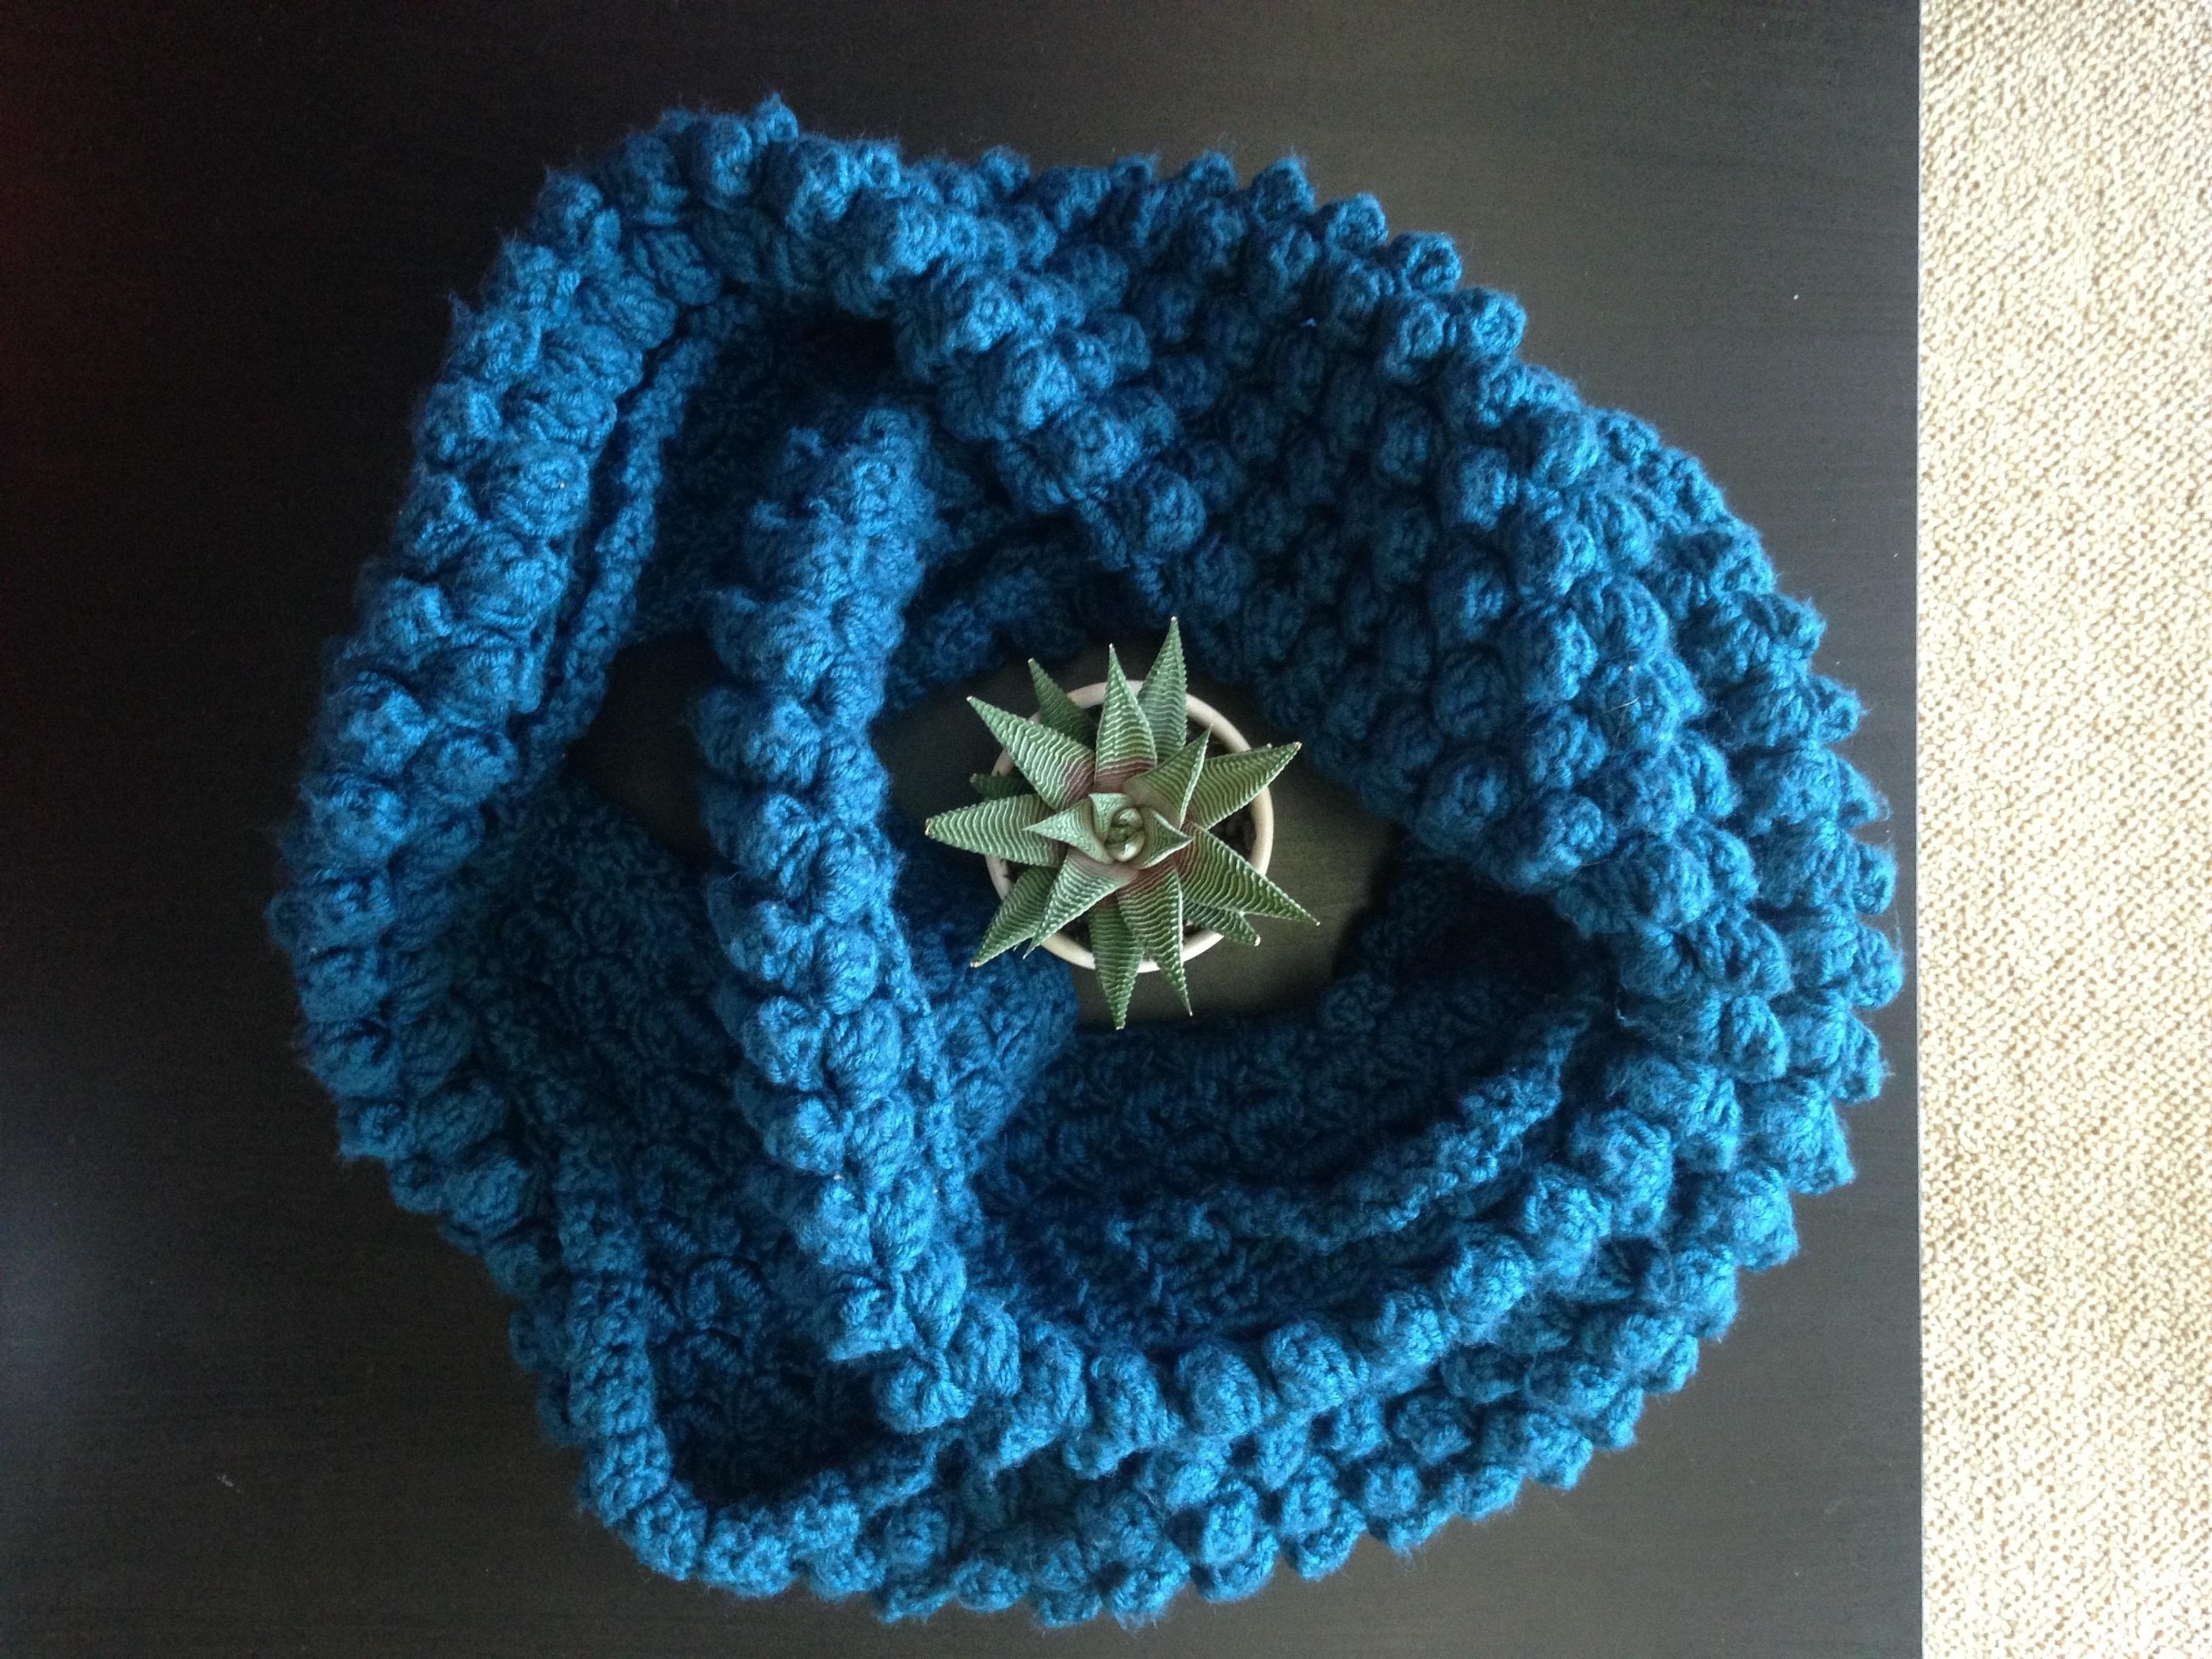 Studio Infinity Scarf How To Knit A Puff Stitch Scarf Yarncraft